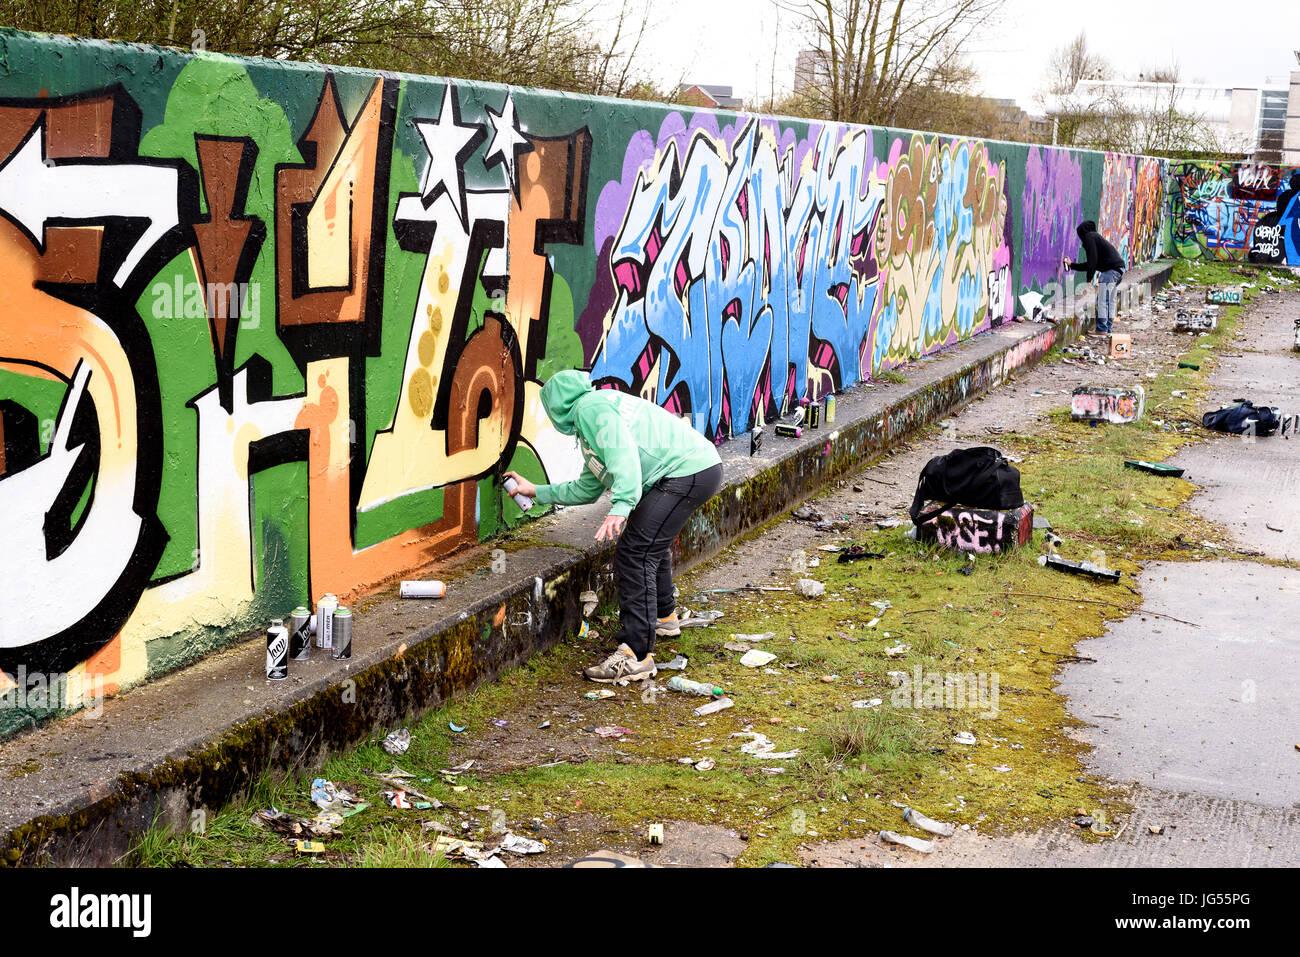 Graffiti wall chelmsford - Chelmsford England 22nd March 2017 Graffiti Artists Working On A Public Wall Spraying Paint